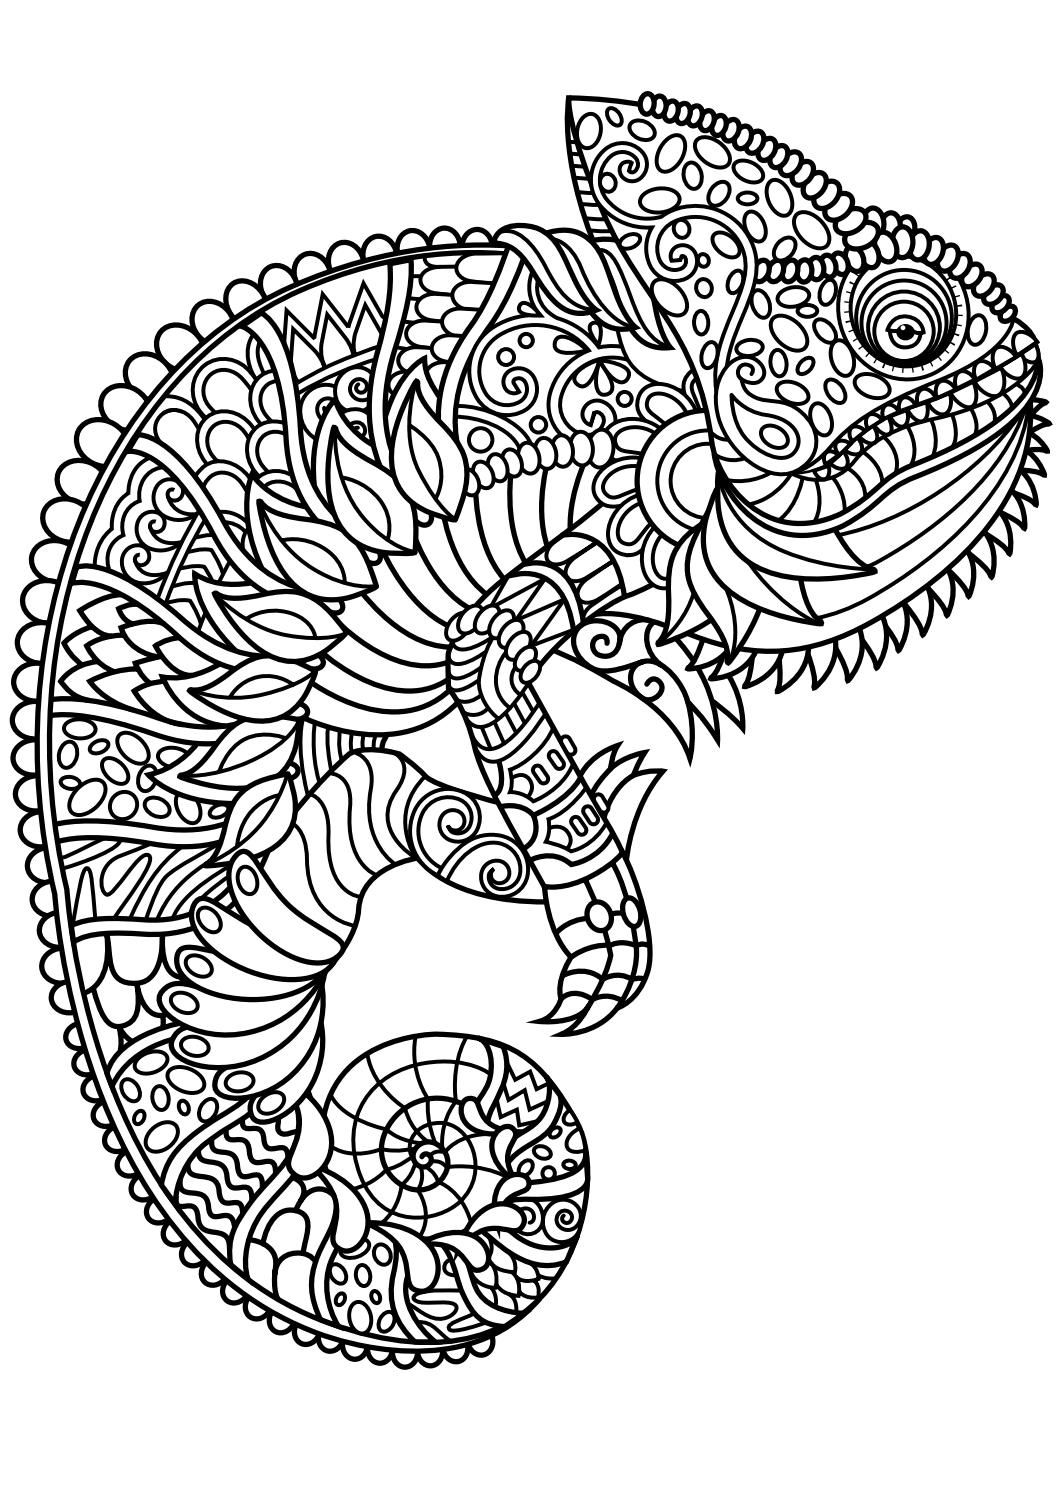 1059x1497 Animal Coloring Pages Pdf Mandalas, Colorear Y Dibujo